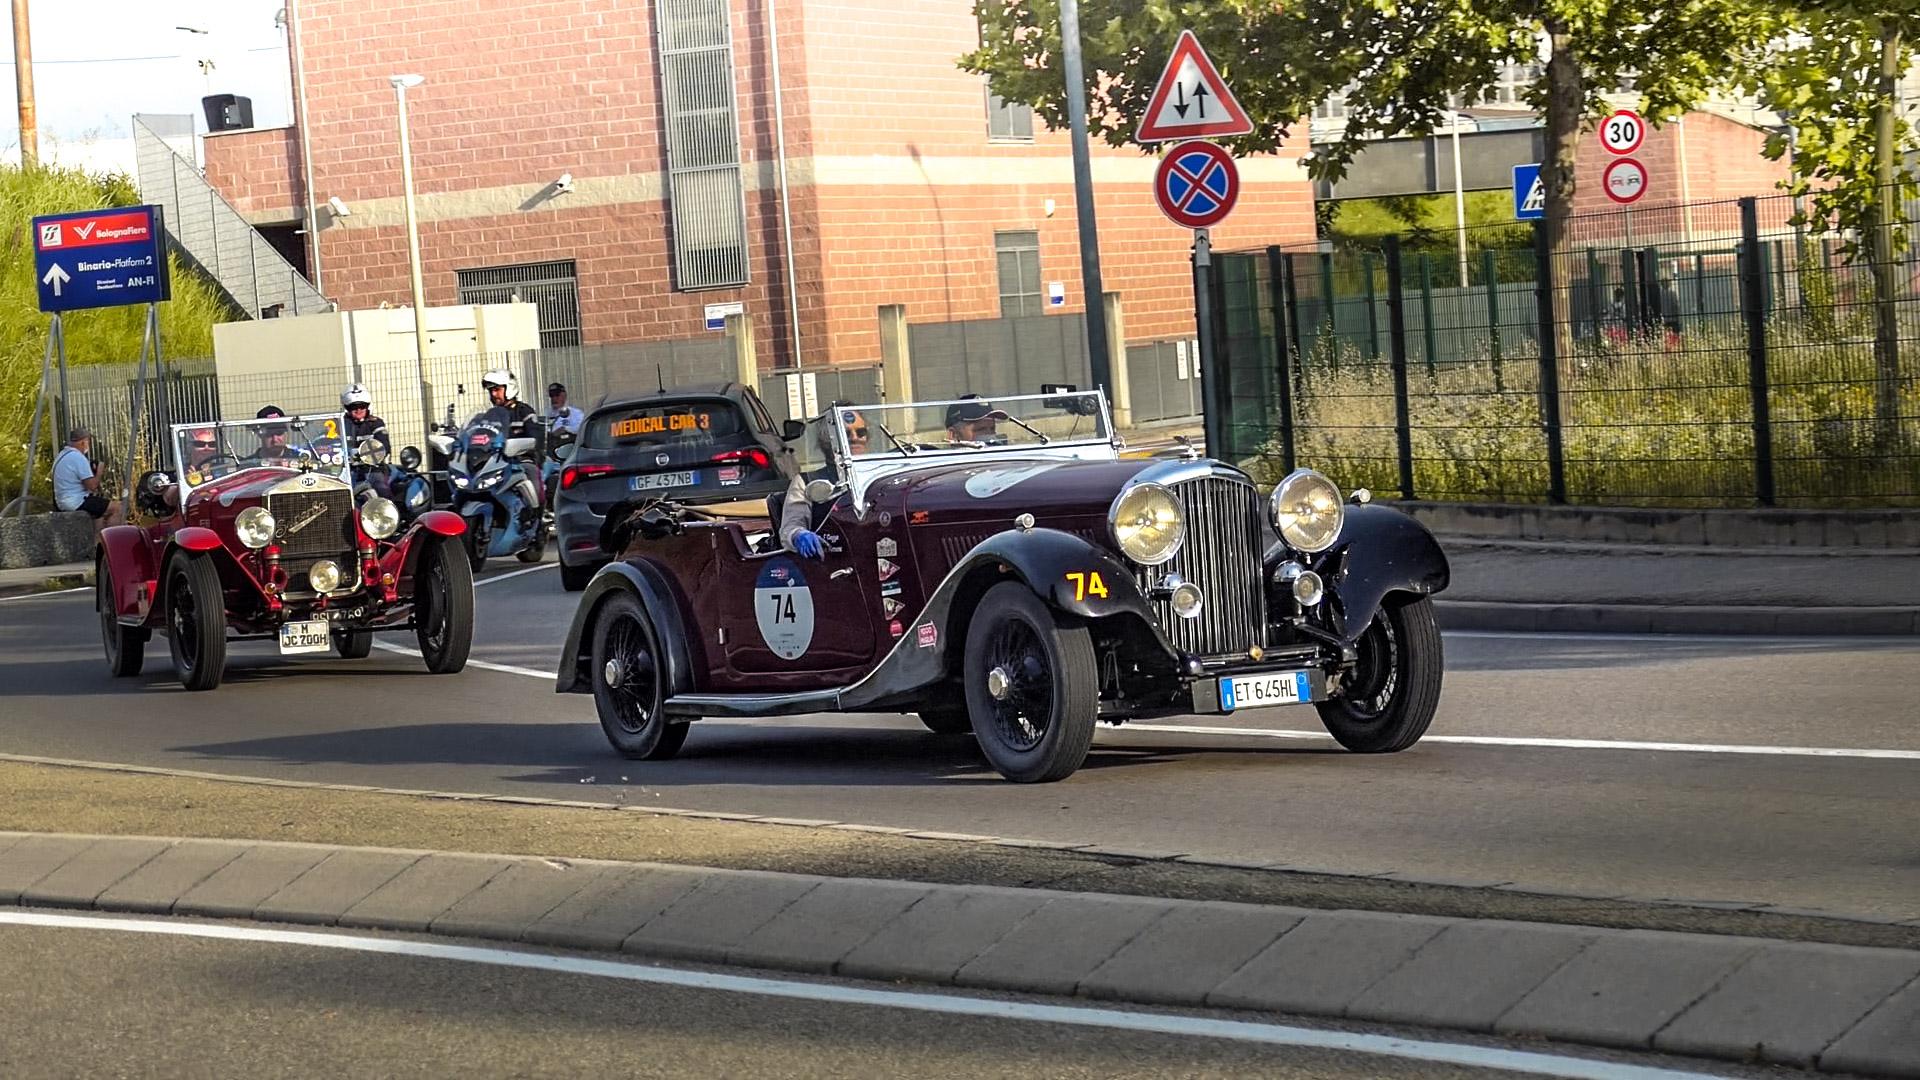 Bentley 3 1/2 Litre Derby - ET-645-HL (ITA)